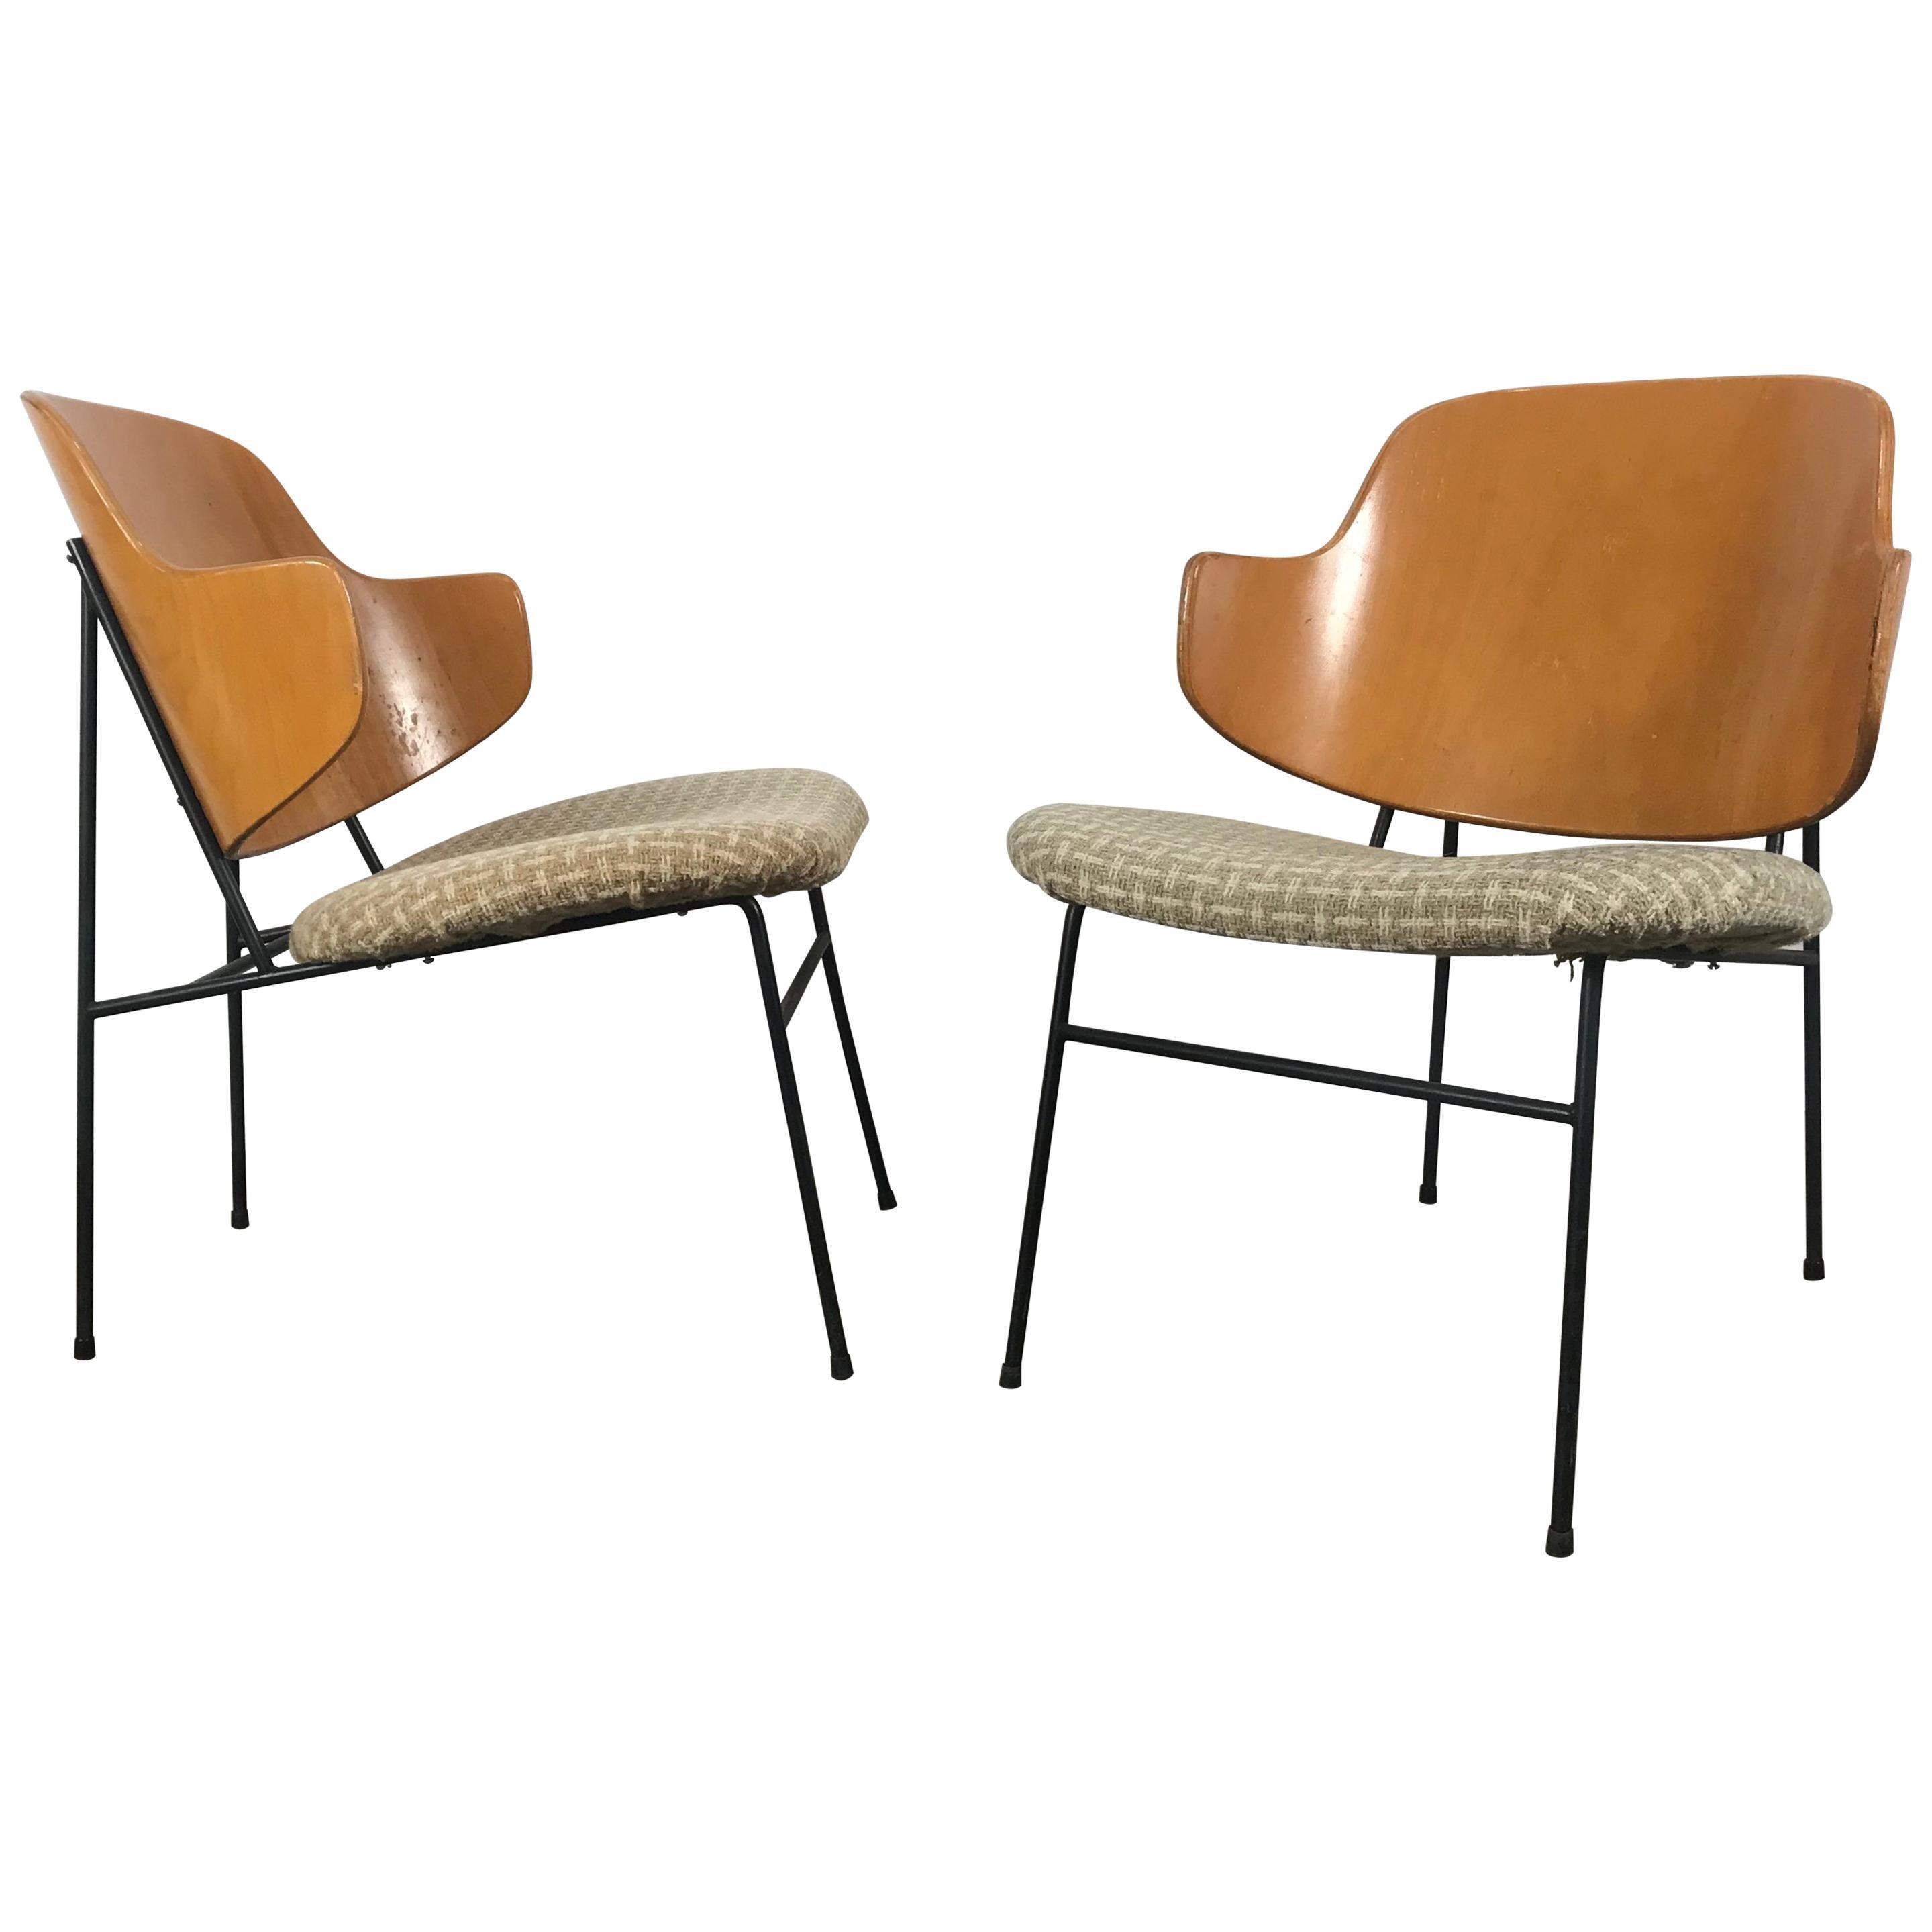 Ib Kofod-Larsen Pair of Penguin Easy Chairs, Denmark